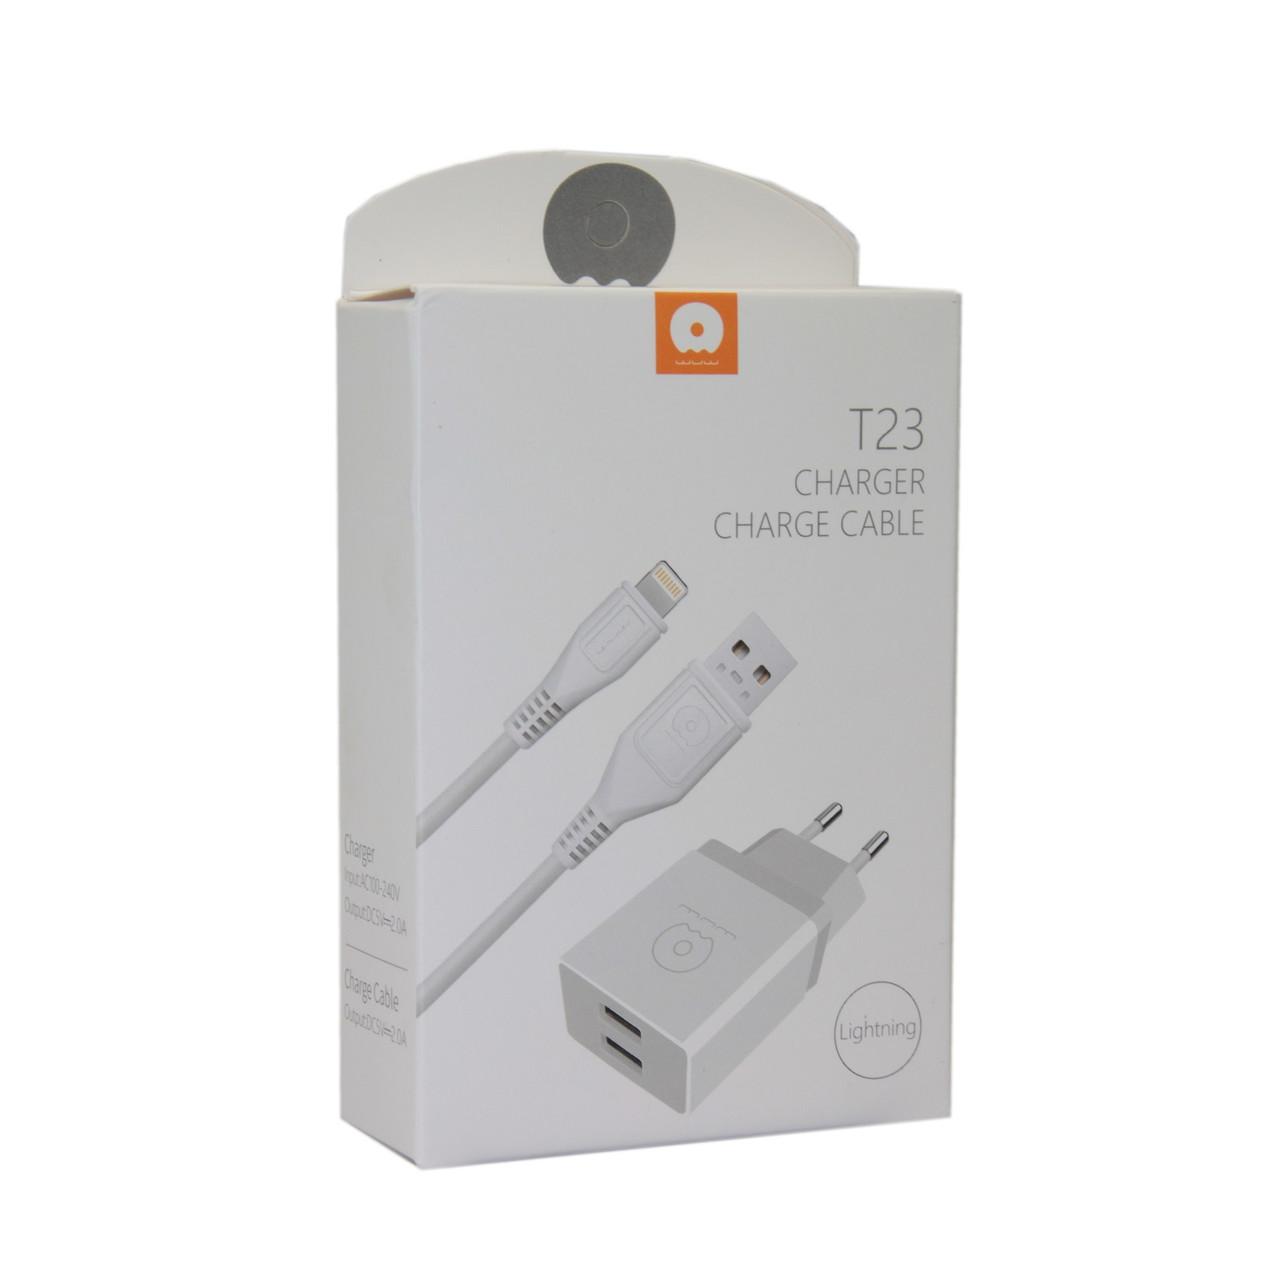 Зарядное устройство WUW T23 Lightning Apple iPhone, iPad